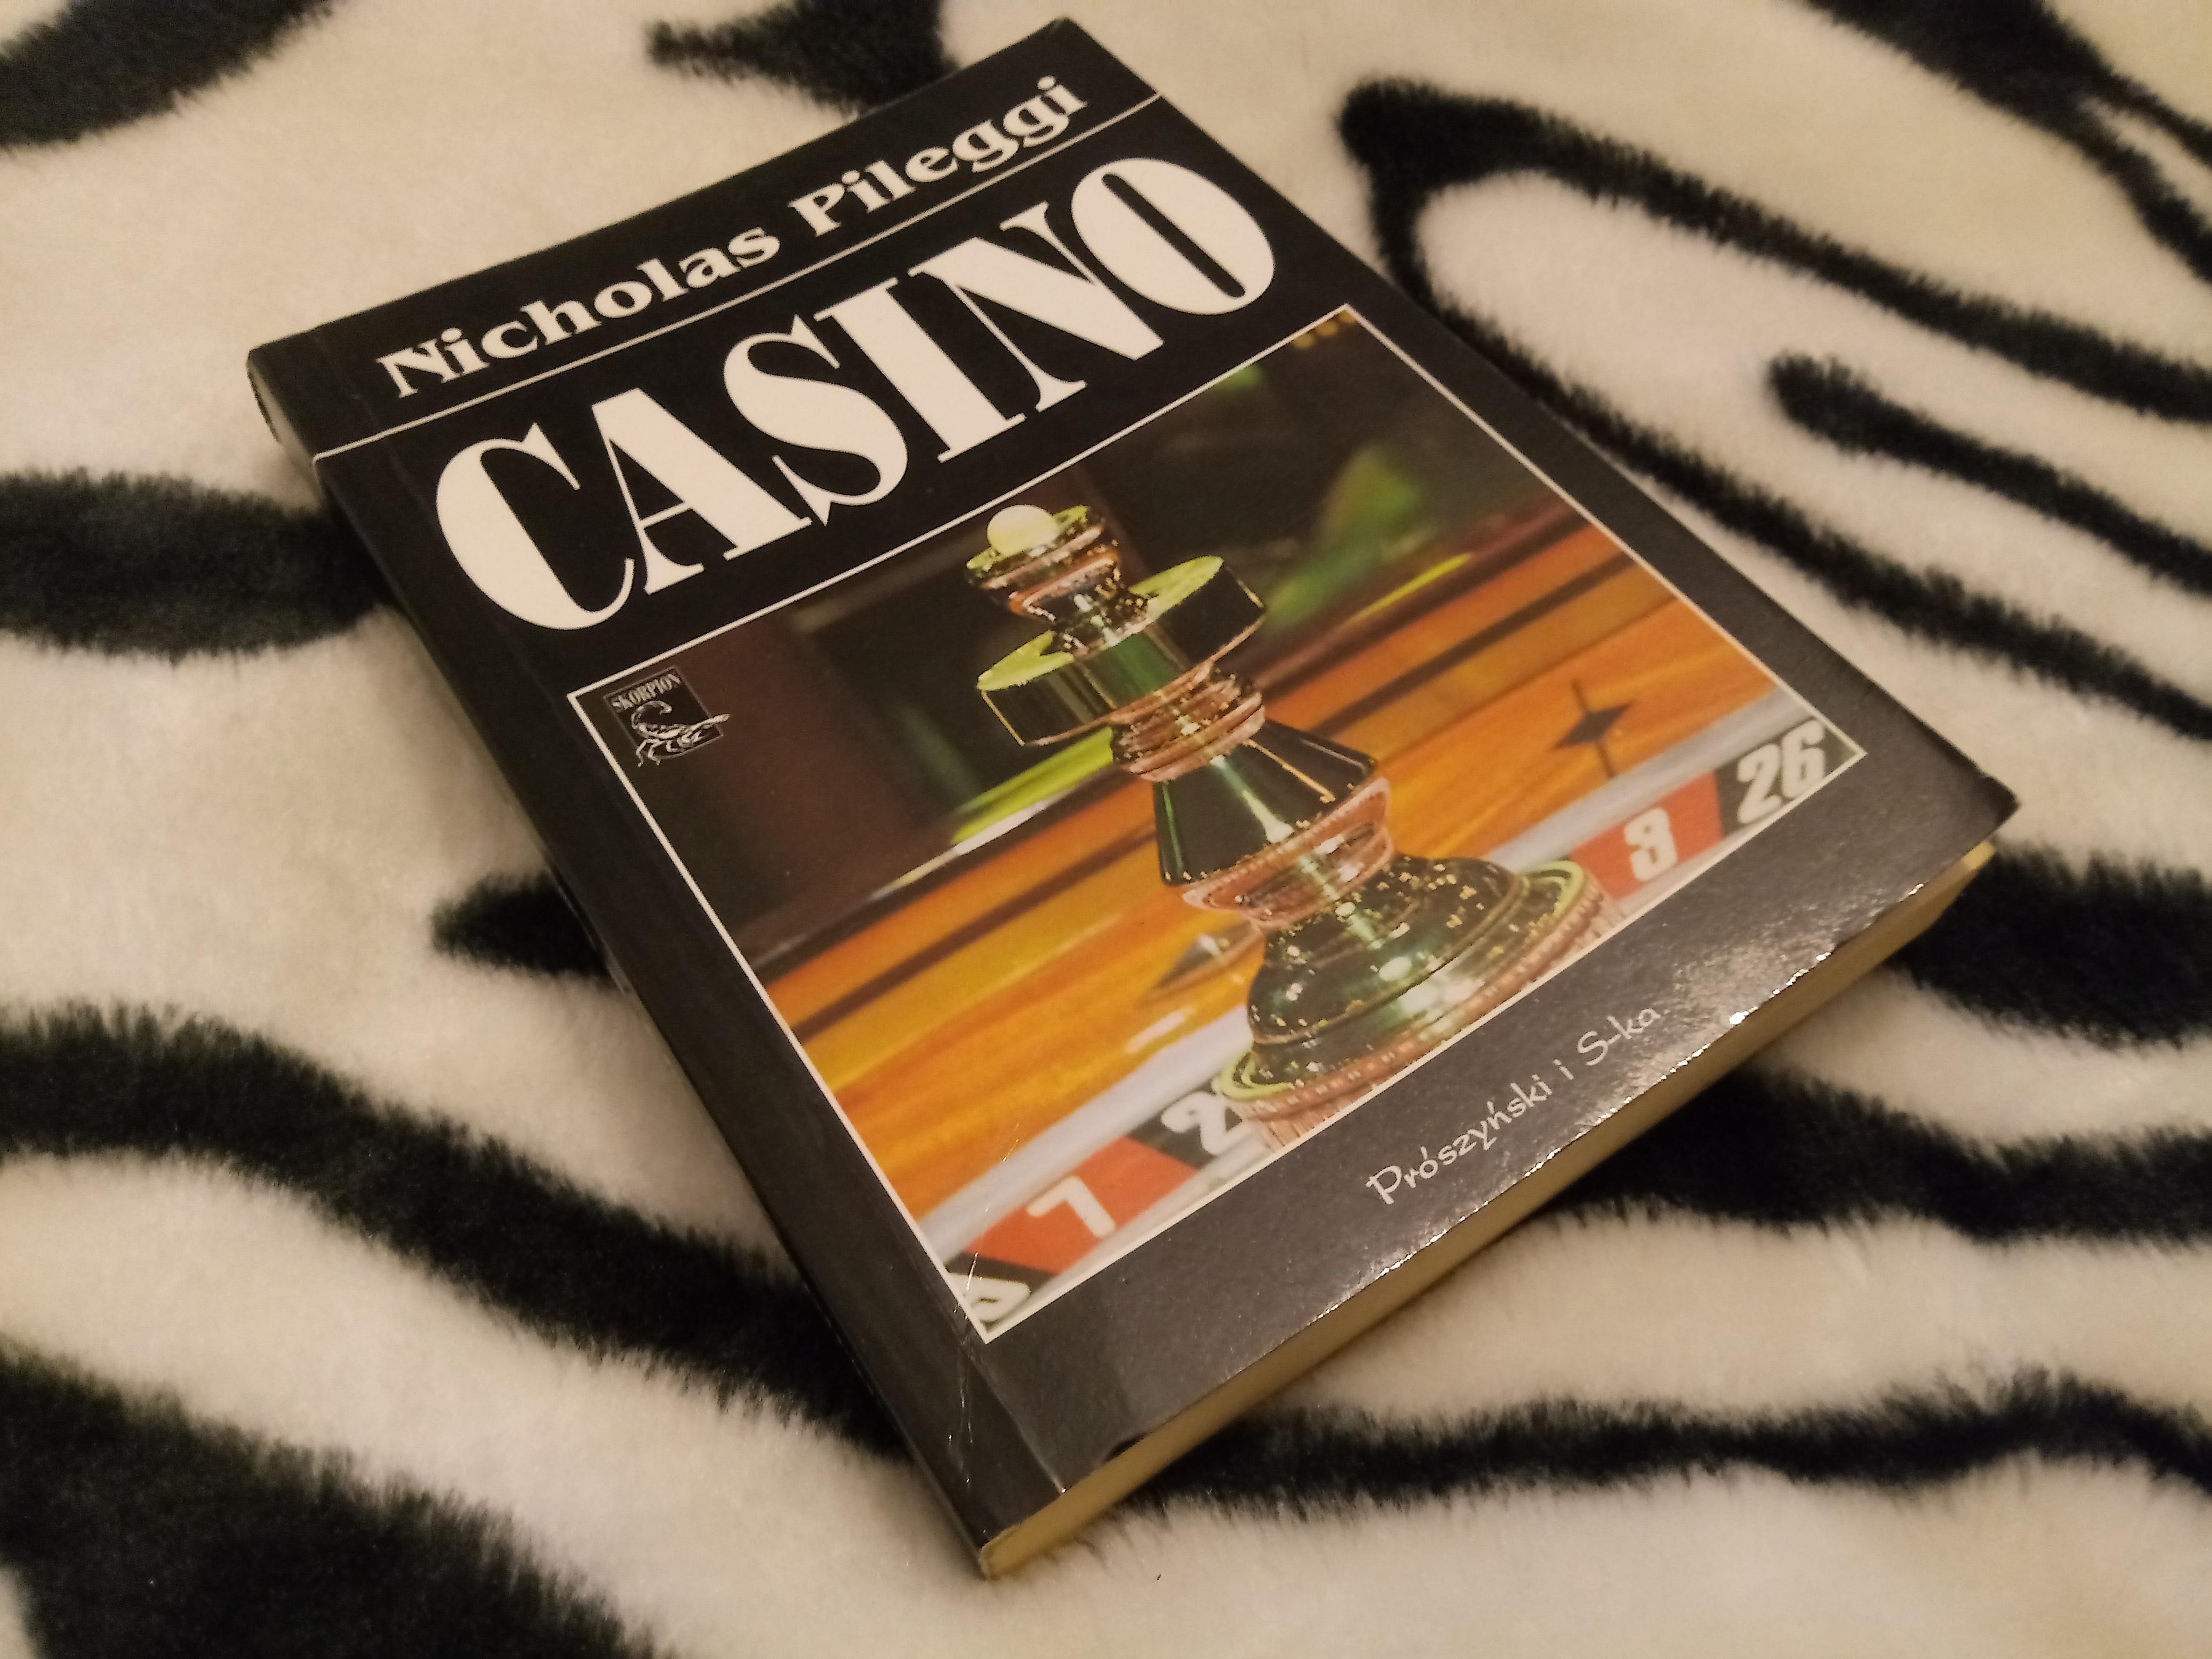 Casino – Nicholas Pileggi